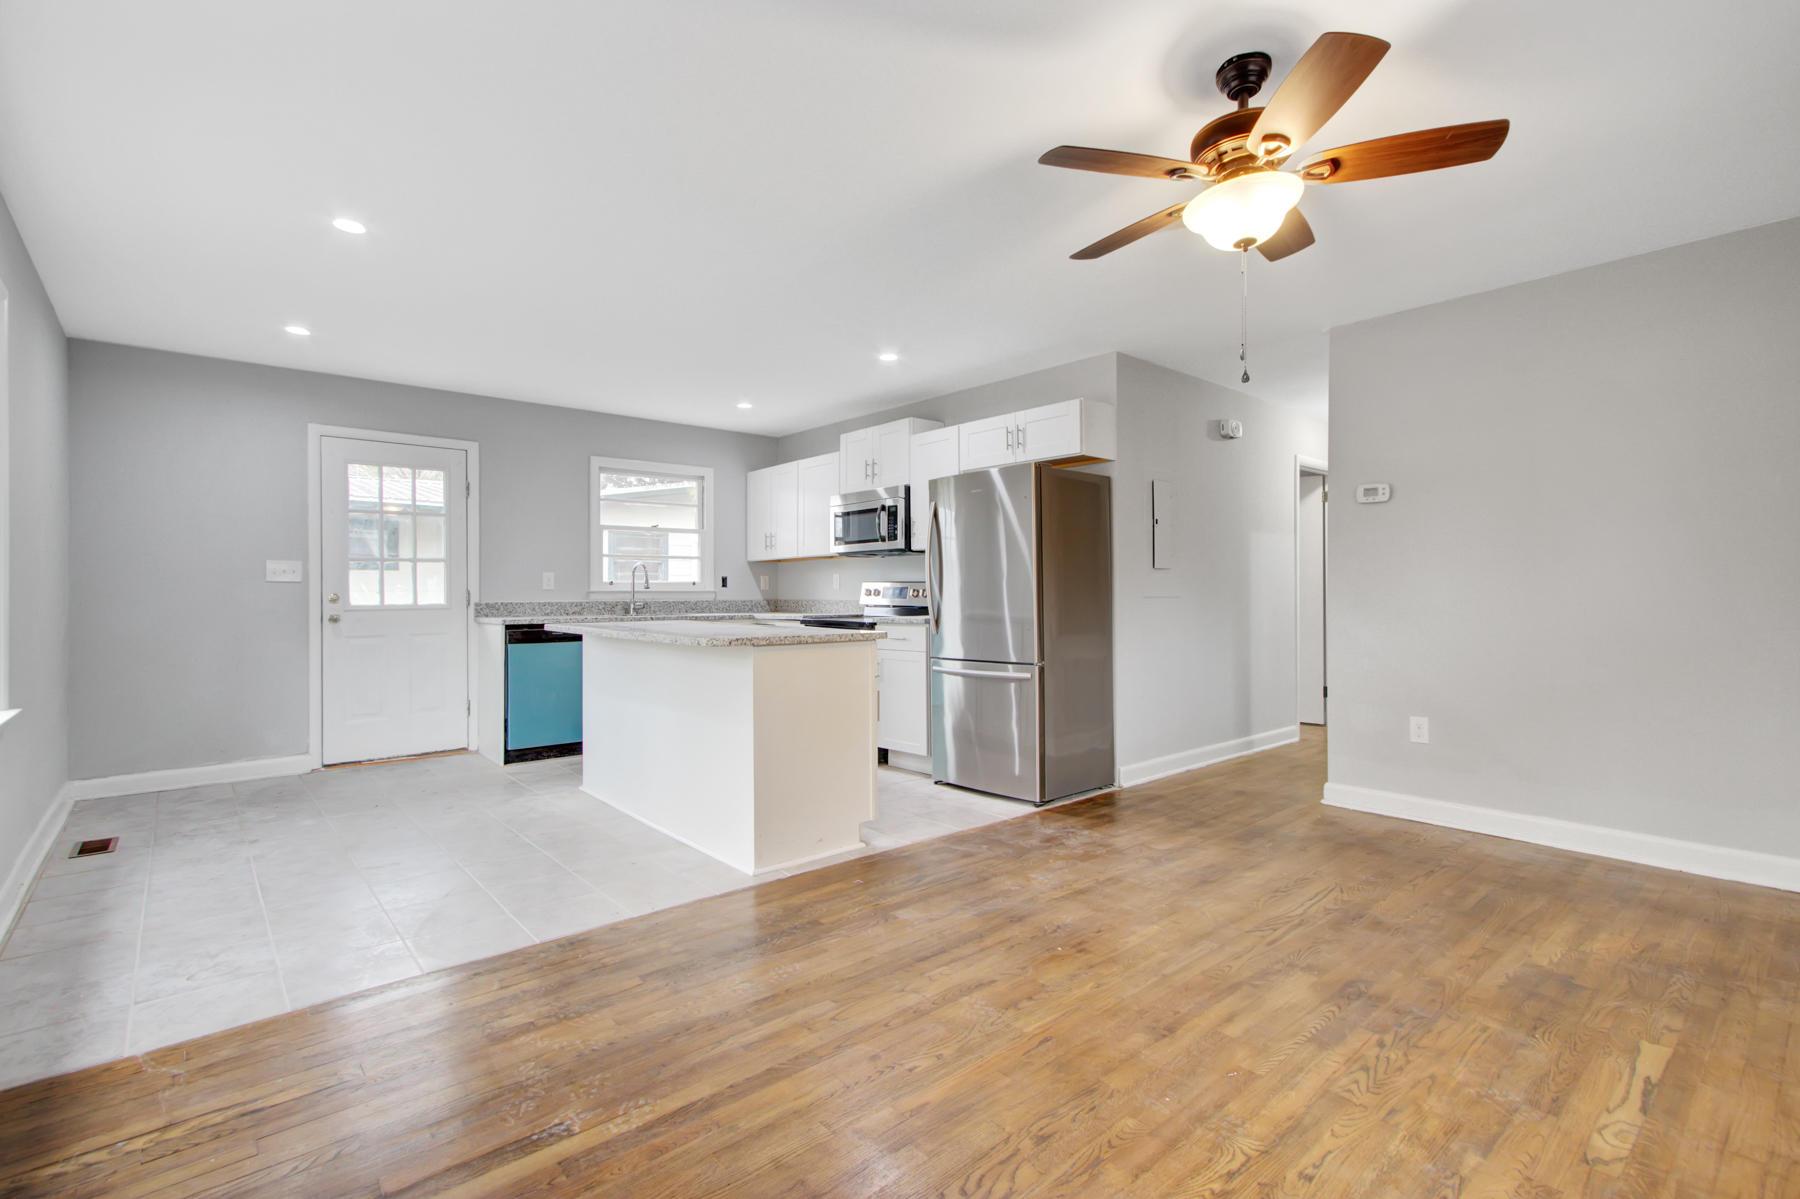 Port Park Homes For Sale - 5820 Sledge, Hanahan, SC - 21